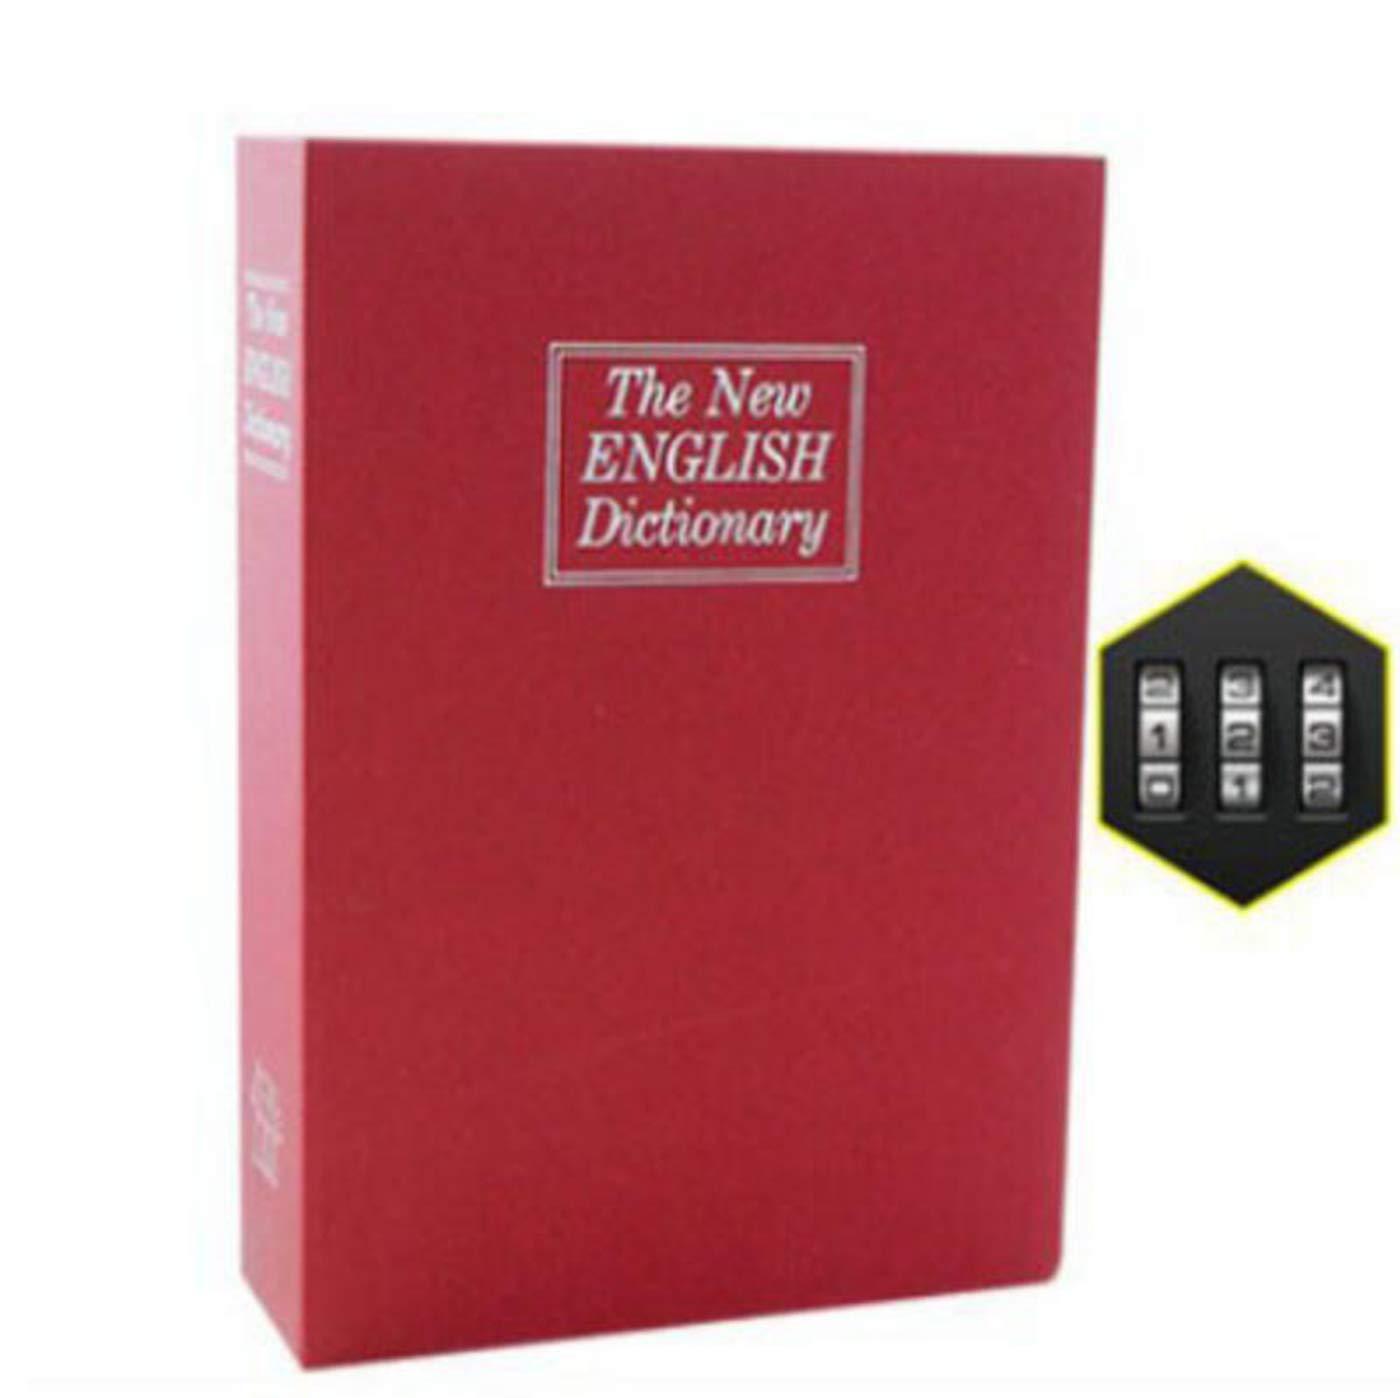 guang Simulated English Dictionary Security Diversion Secret Hidden Book Piggy Bank Medium Storage Box Password Box,Red